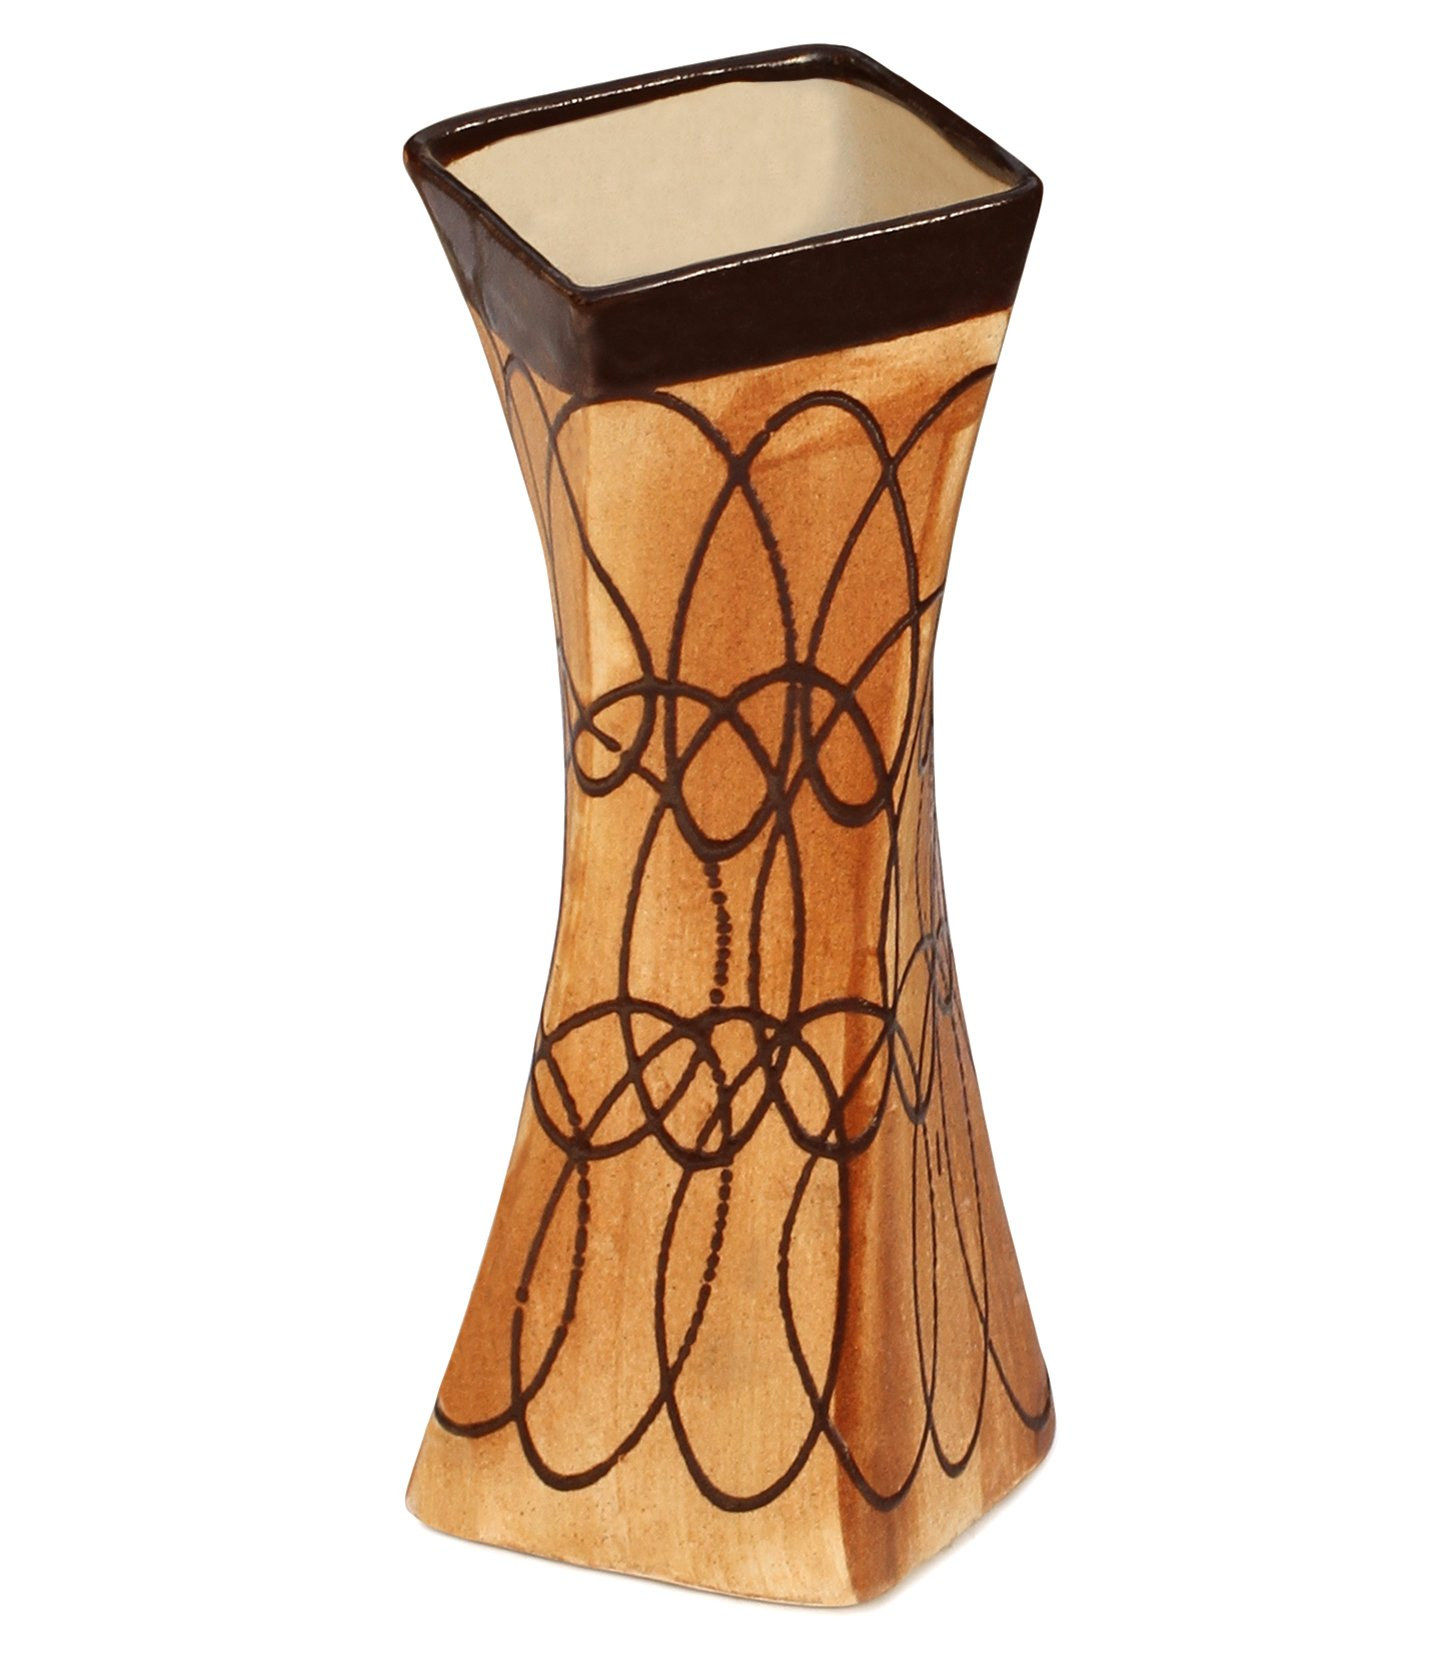 Buy Valentines Day Flower Vase Twisted Turns Decorative Vase For